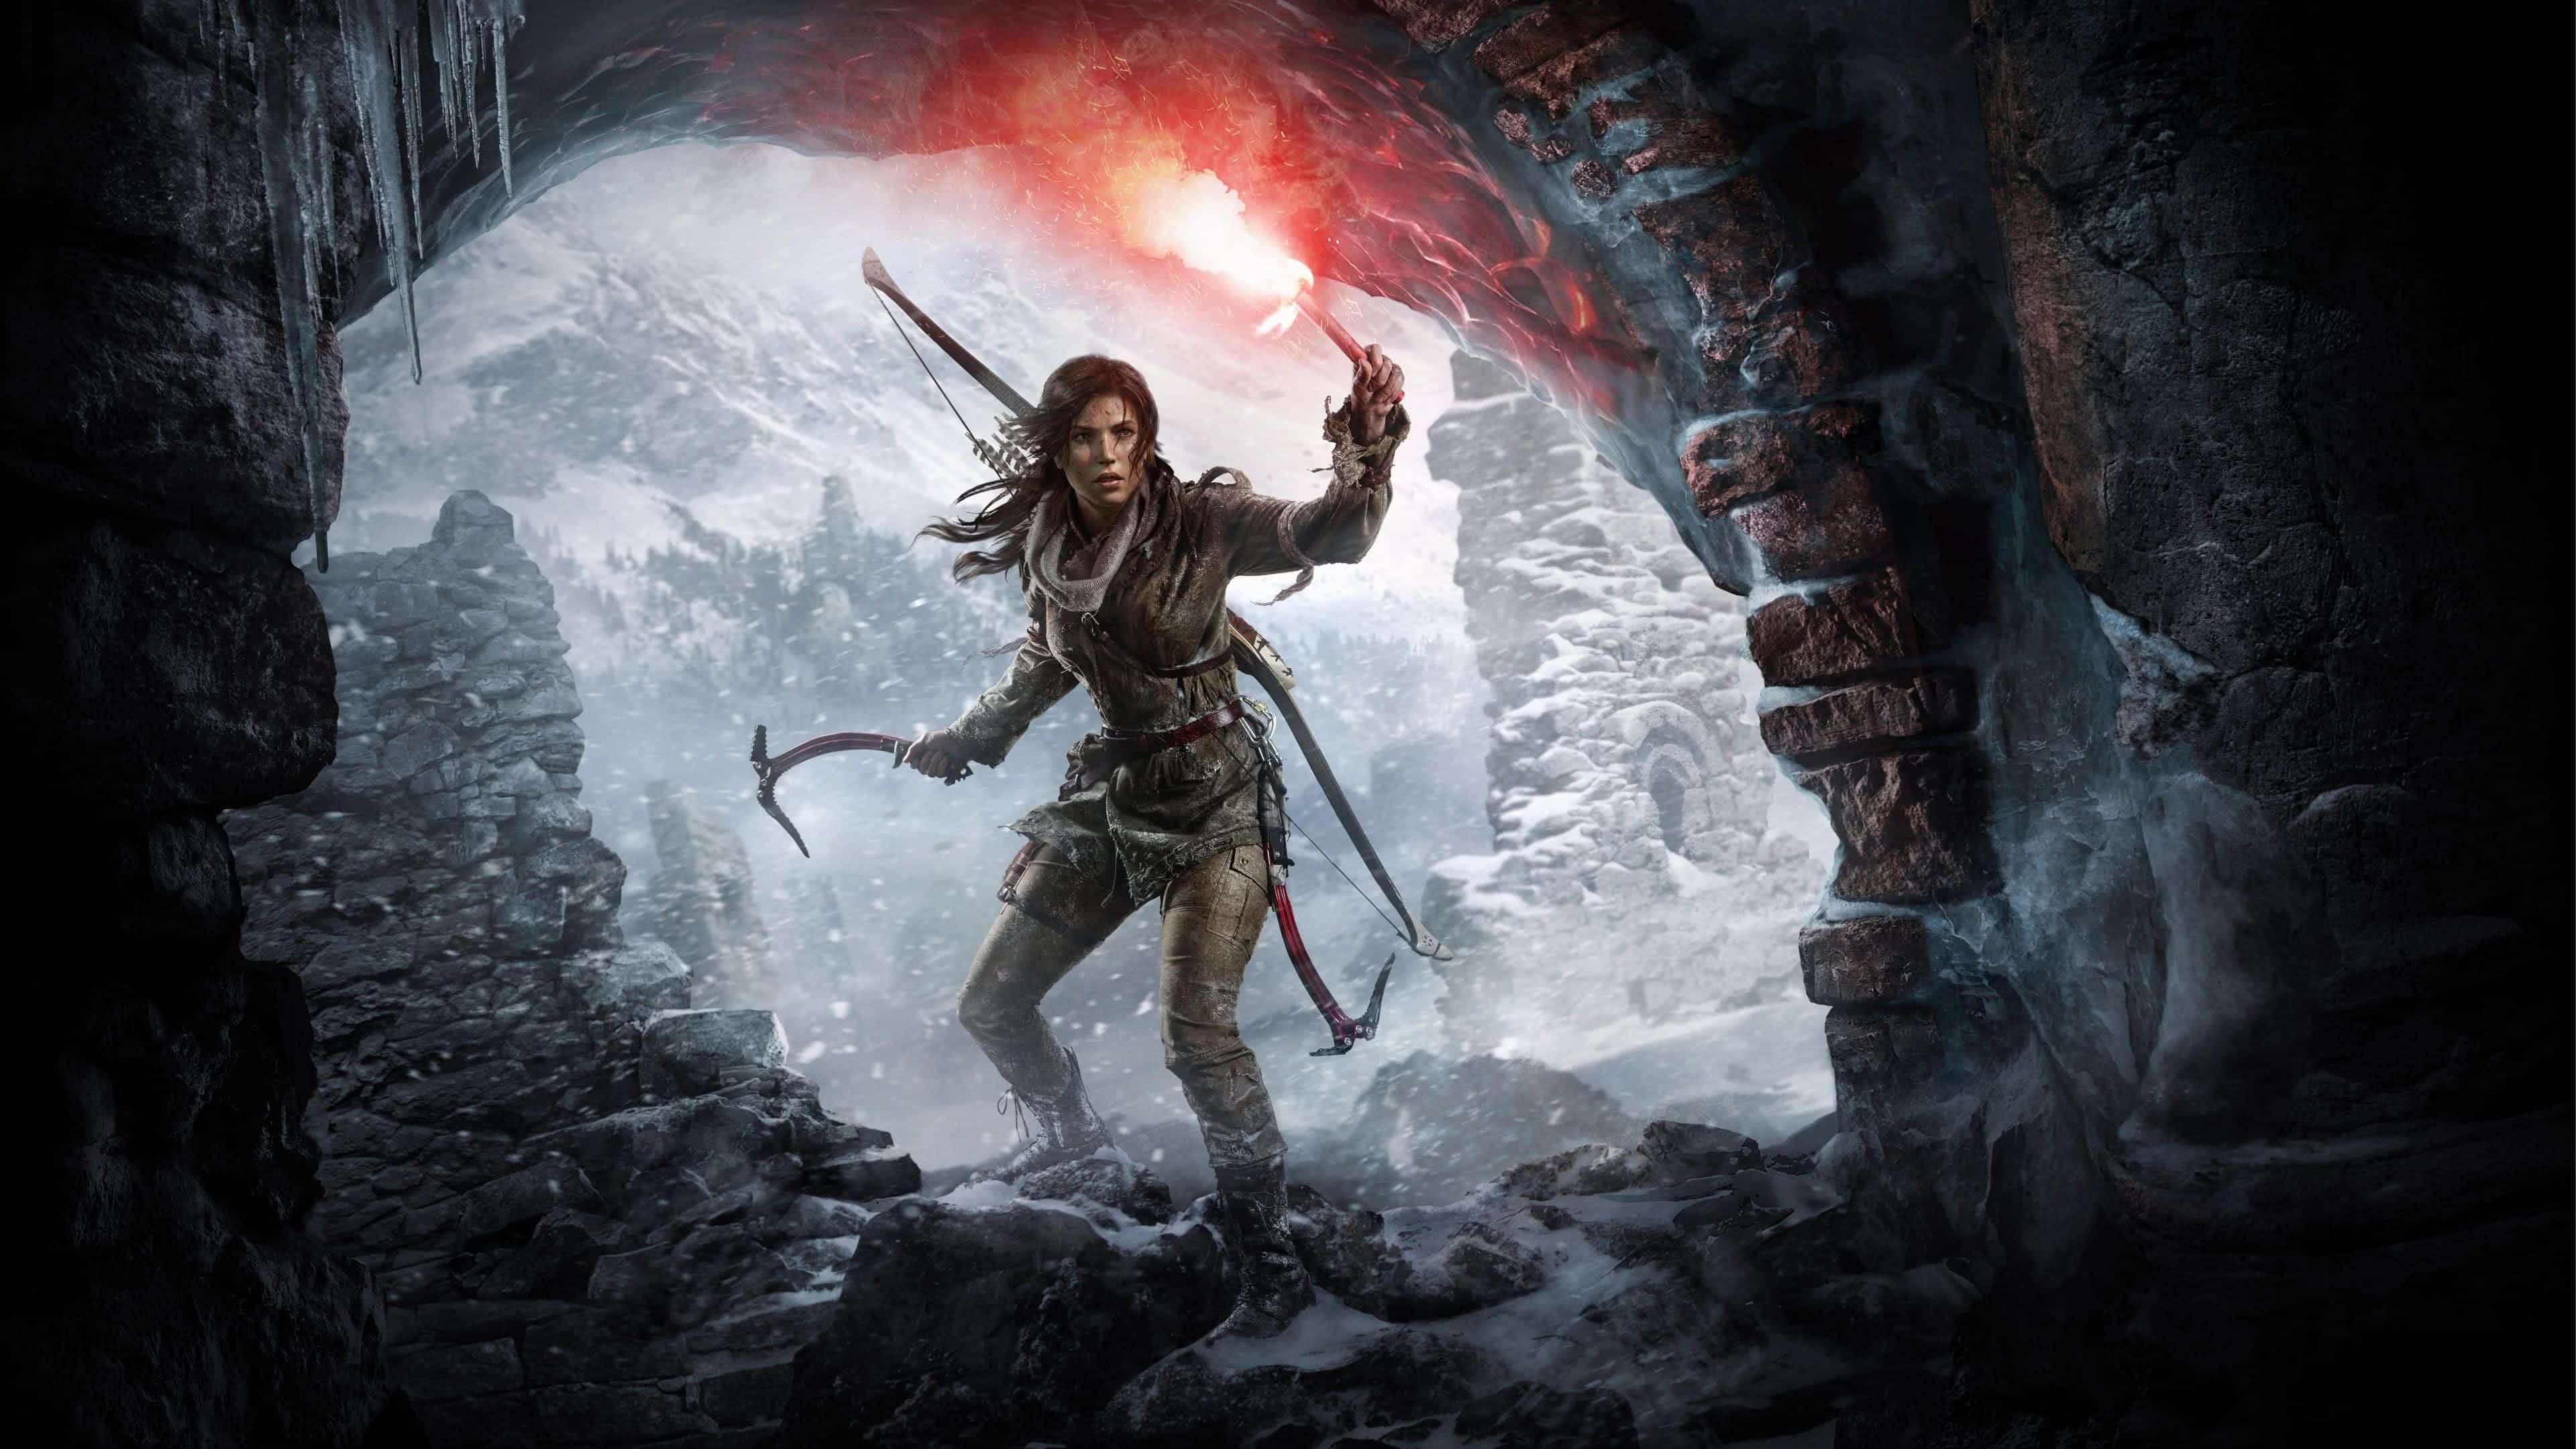 Rise of the tomb raider lara croft uhd 4k wallpaper pixelz - Rise of the tomb raider 4k wallpaper ...